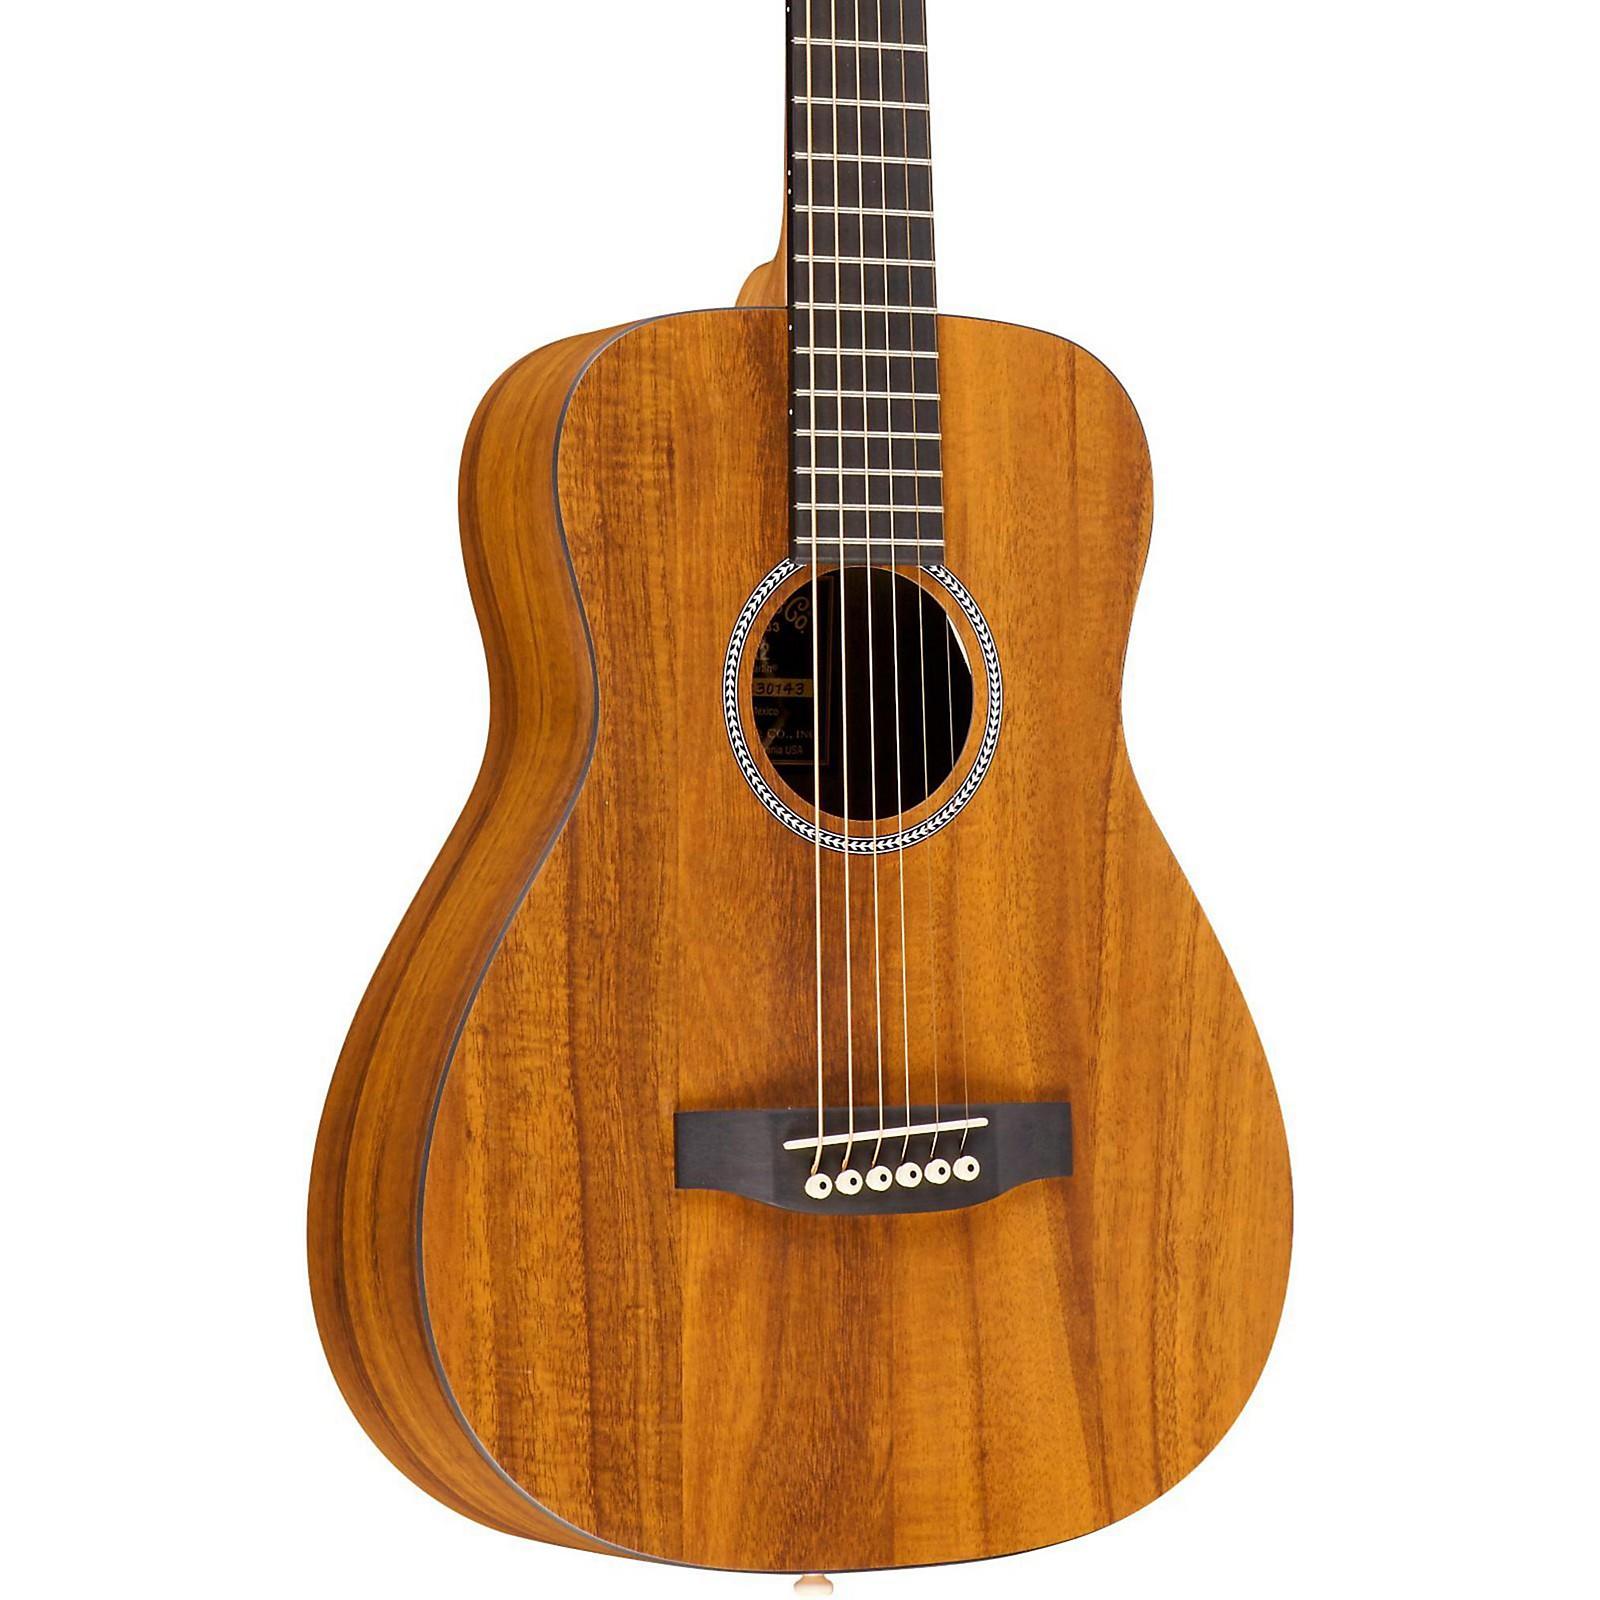 Martin LX Koa Little Martin Acoustic Guitar